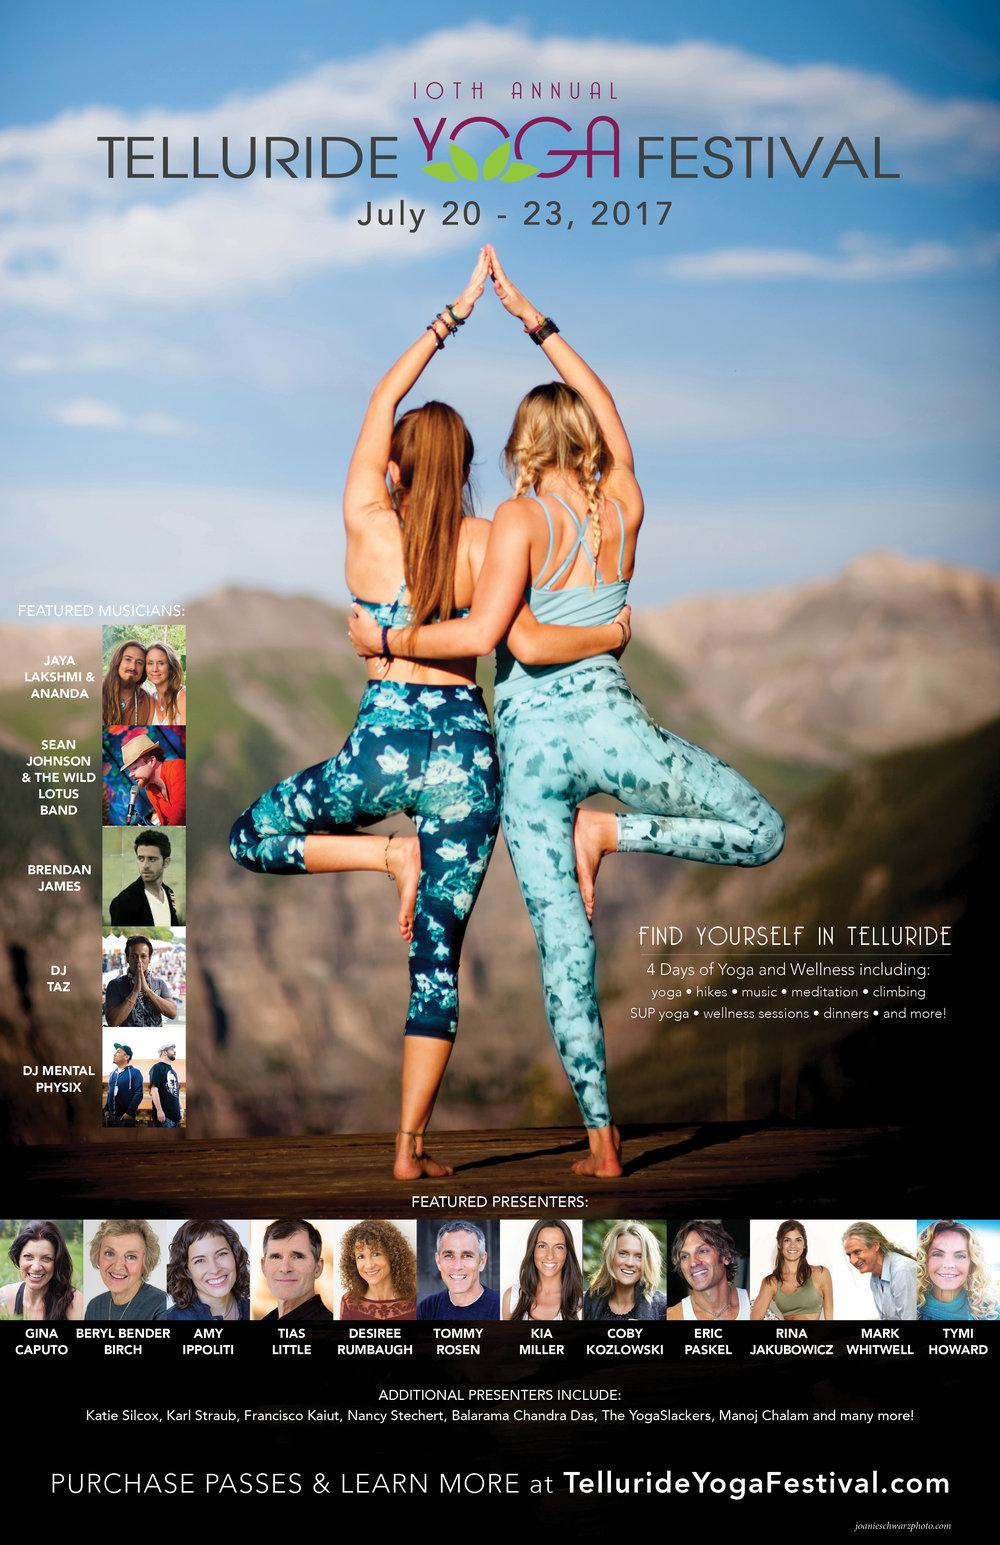 Telluride Yoga Festival 2017 Poster Hi Res for Printing -11 x 17 jpg